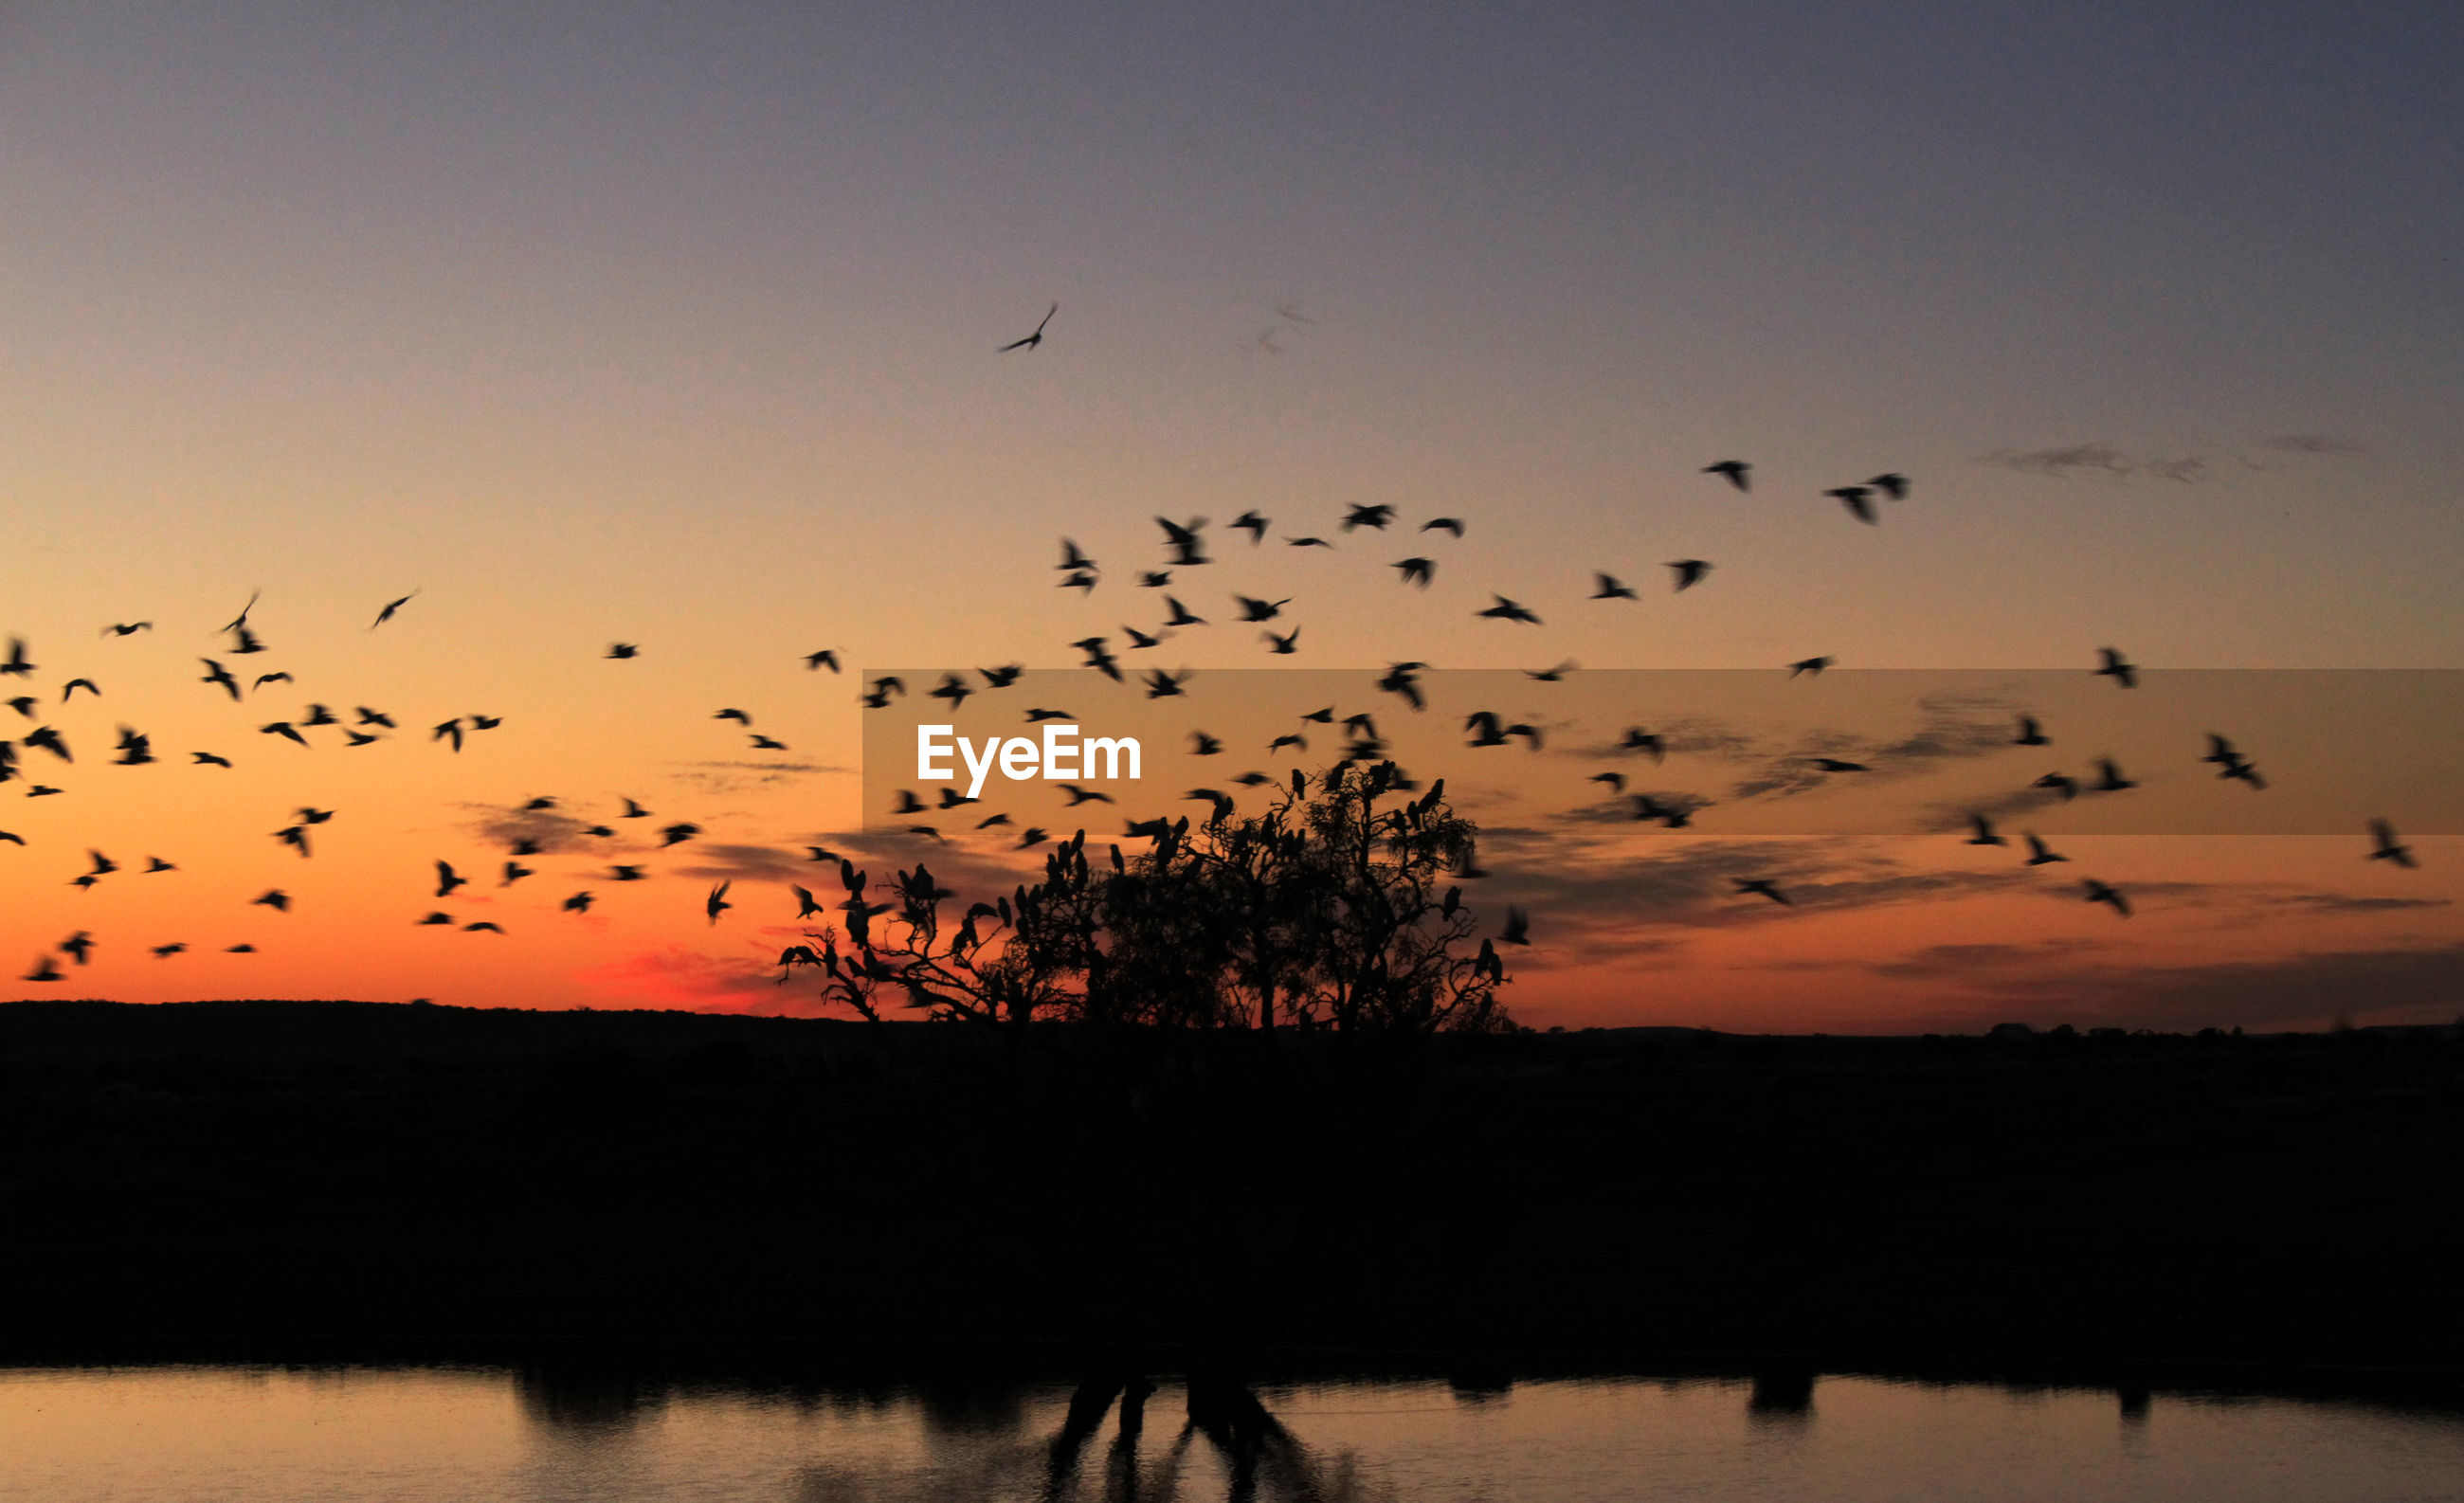 Silhouette birds flying over landscape against sky during sunset